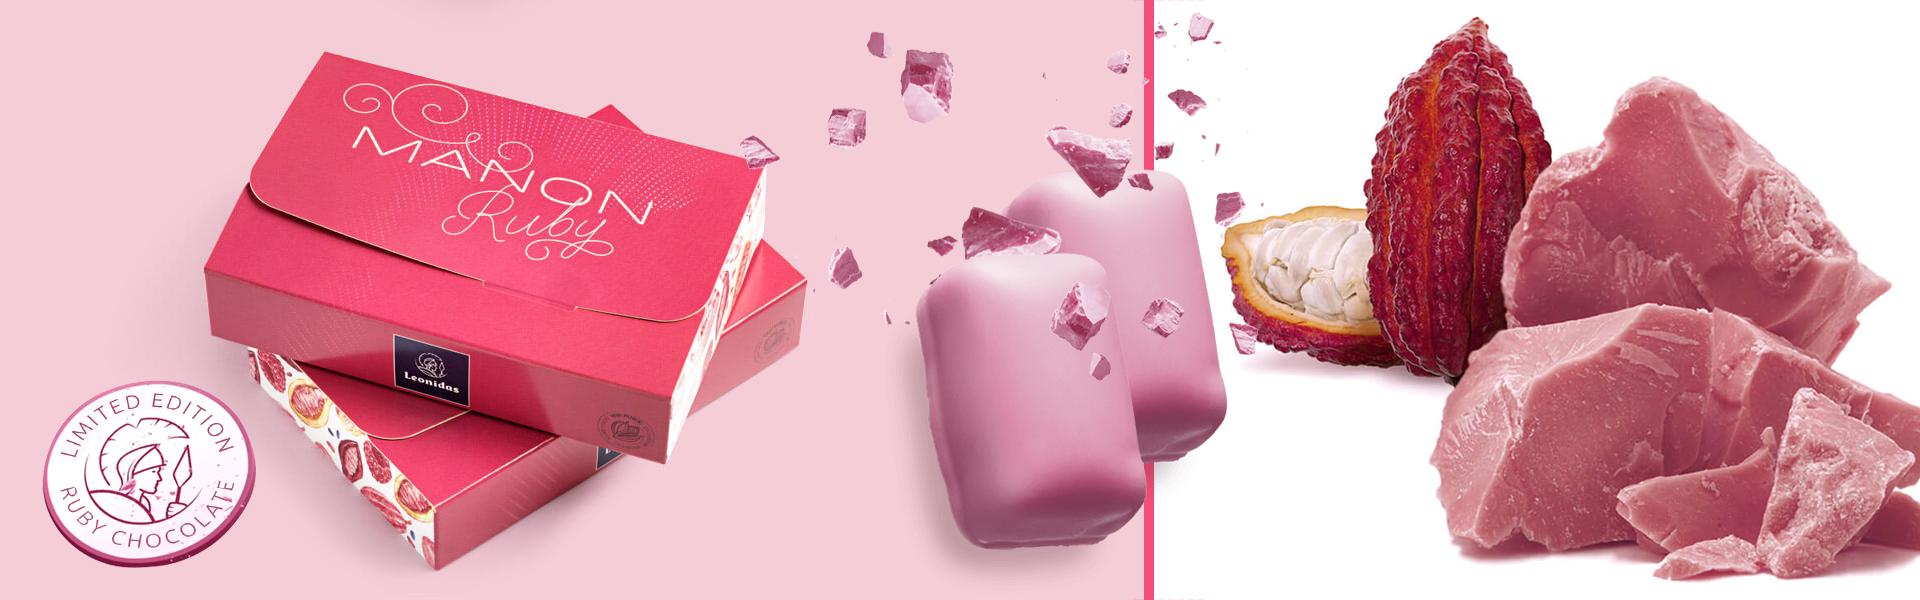 Manon Ruby – Έκρηξη γεύσης